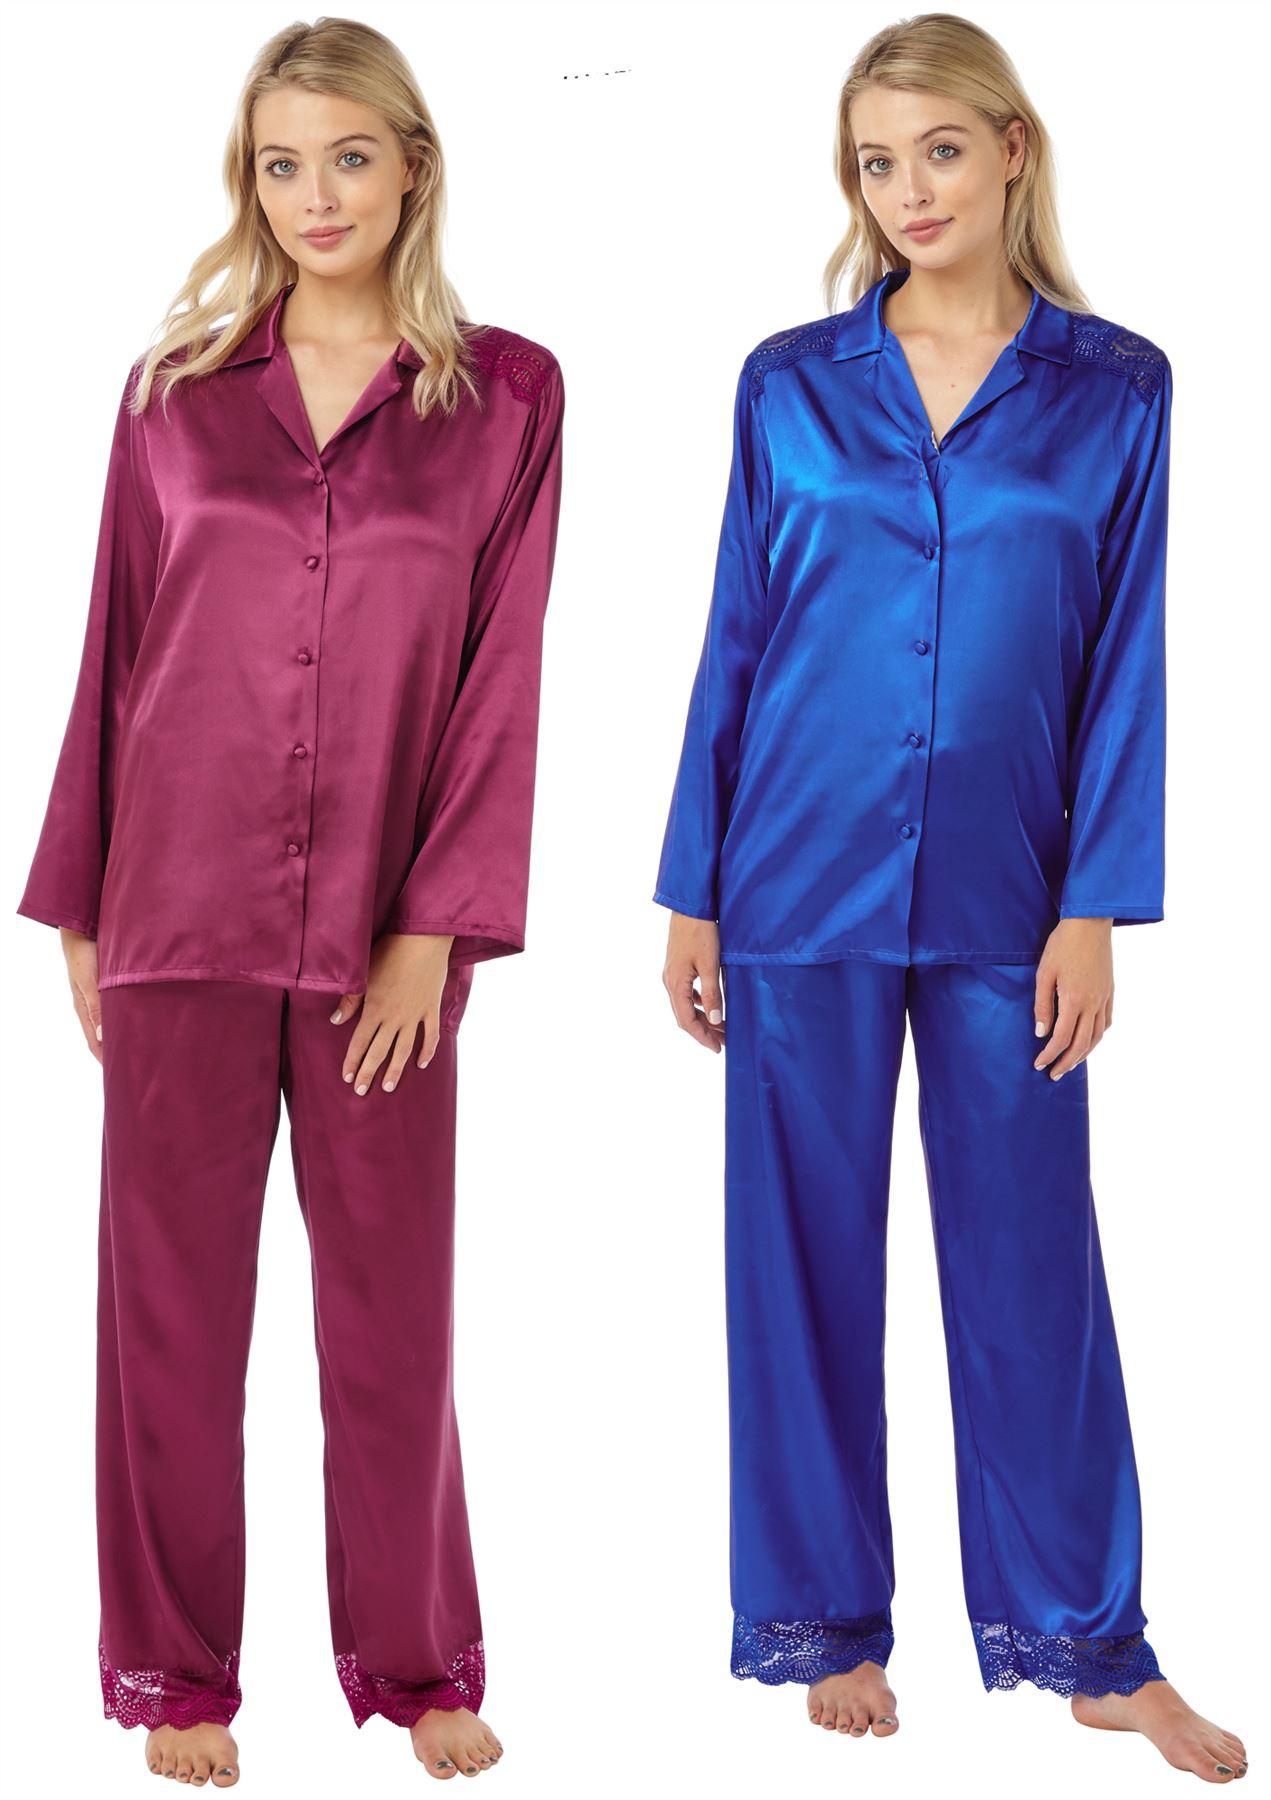 Womens Indigo Sky Charmeuse Satin Long Sleeve Pyjamas IN15115